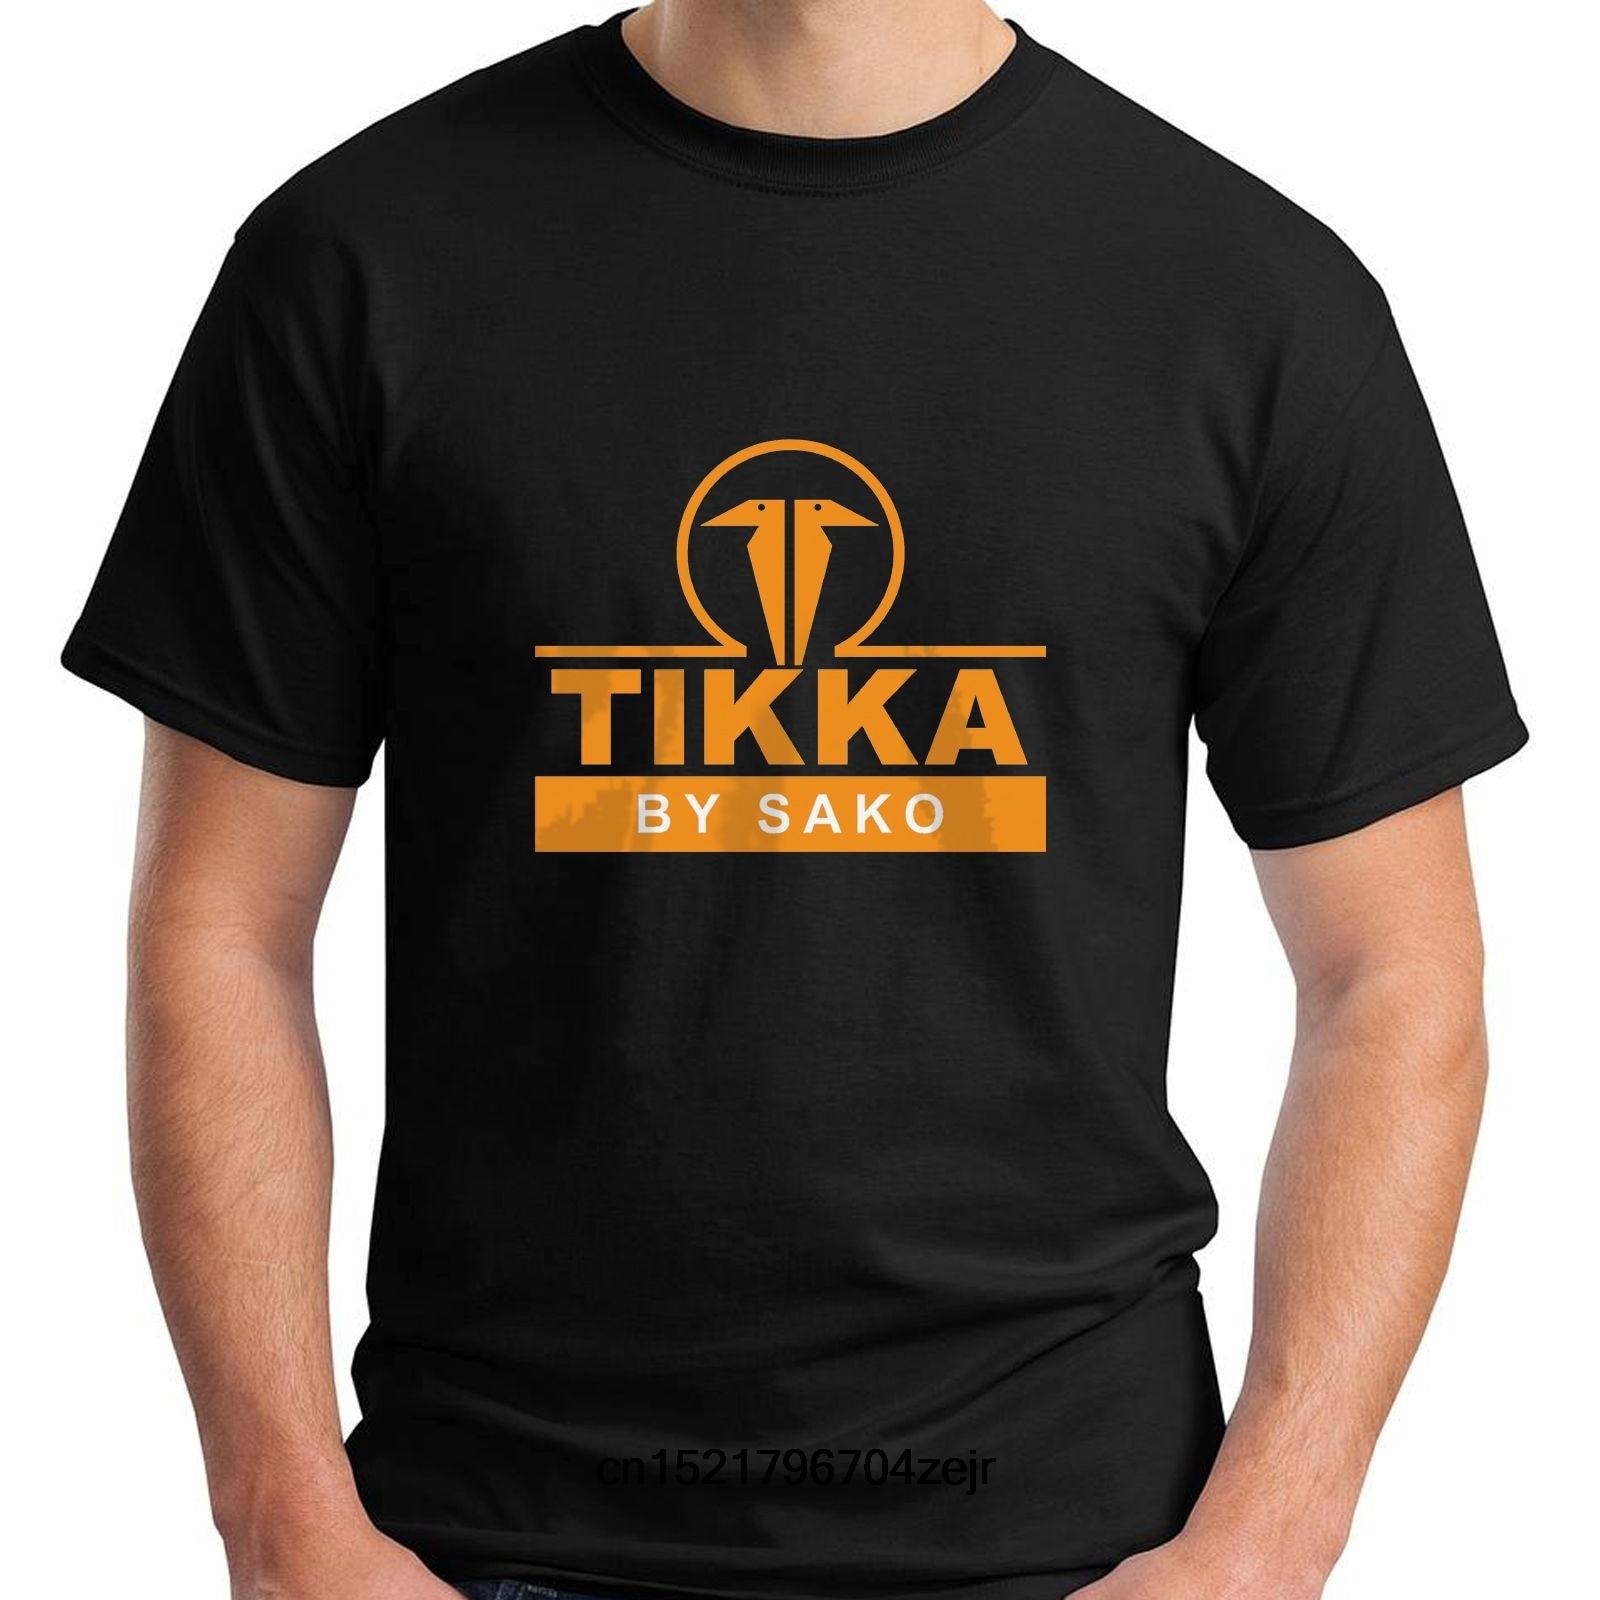 Men T shirt New TIKKA by SAKO Firearms Company Logo Gun Army Black funny t-shirt novelty tshirt women